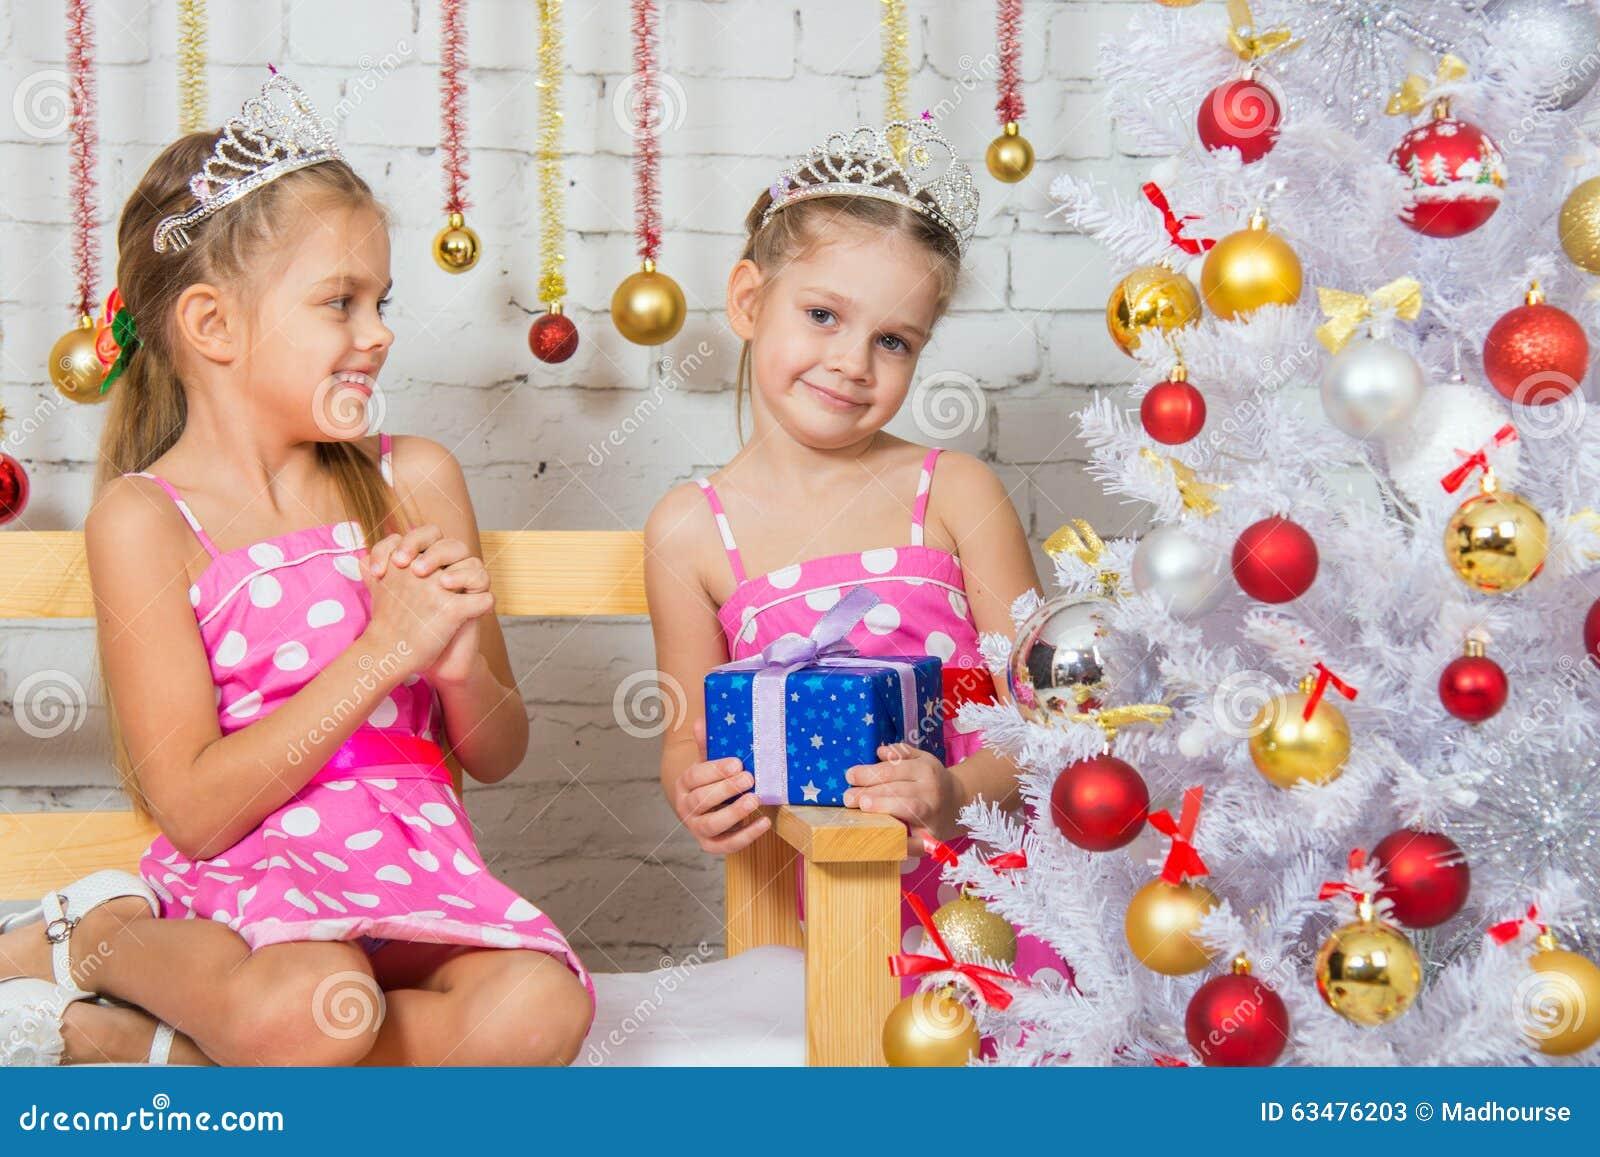 The Girl Gave Her Sister A Christmas Gift Stock Image ...